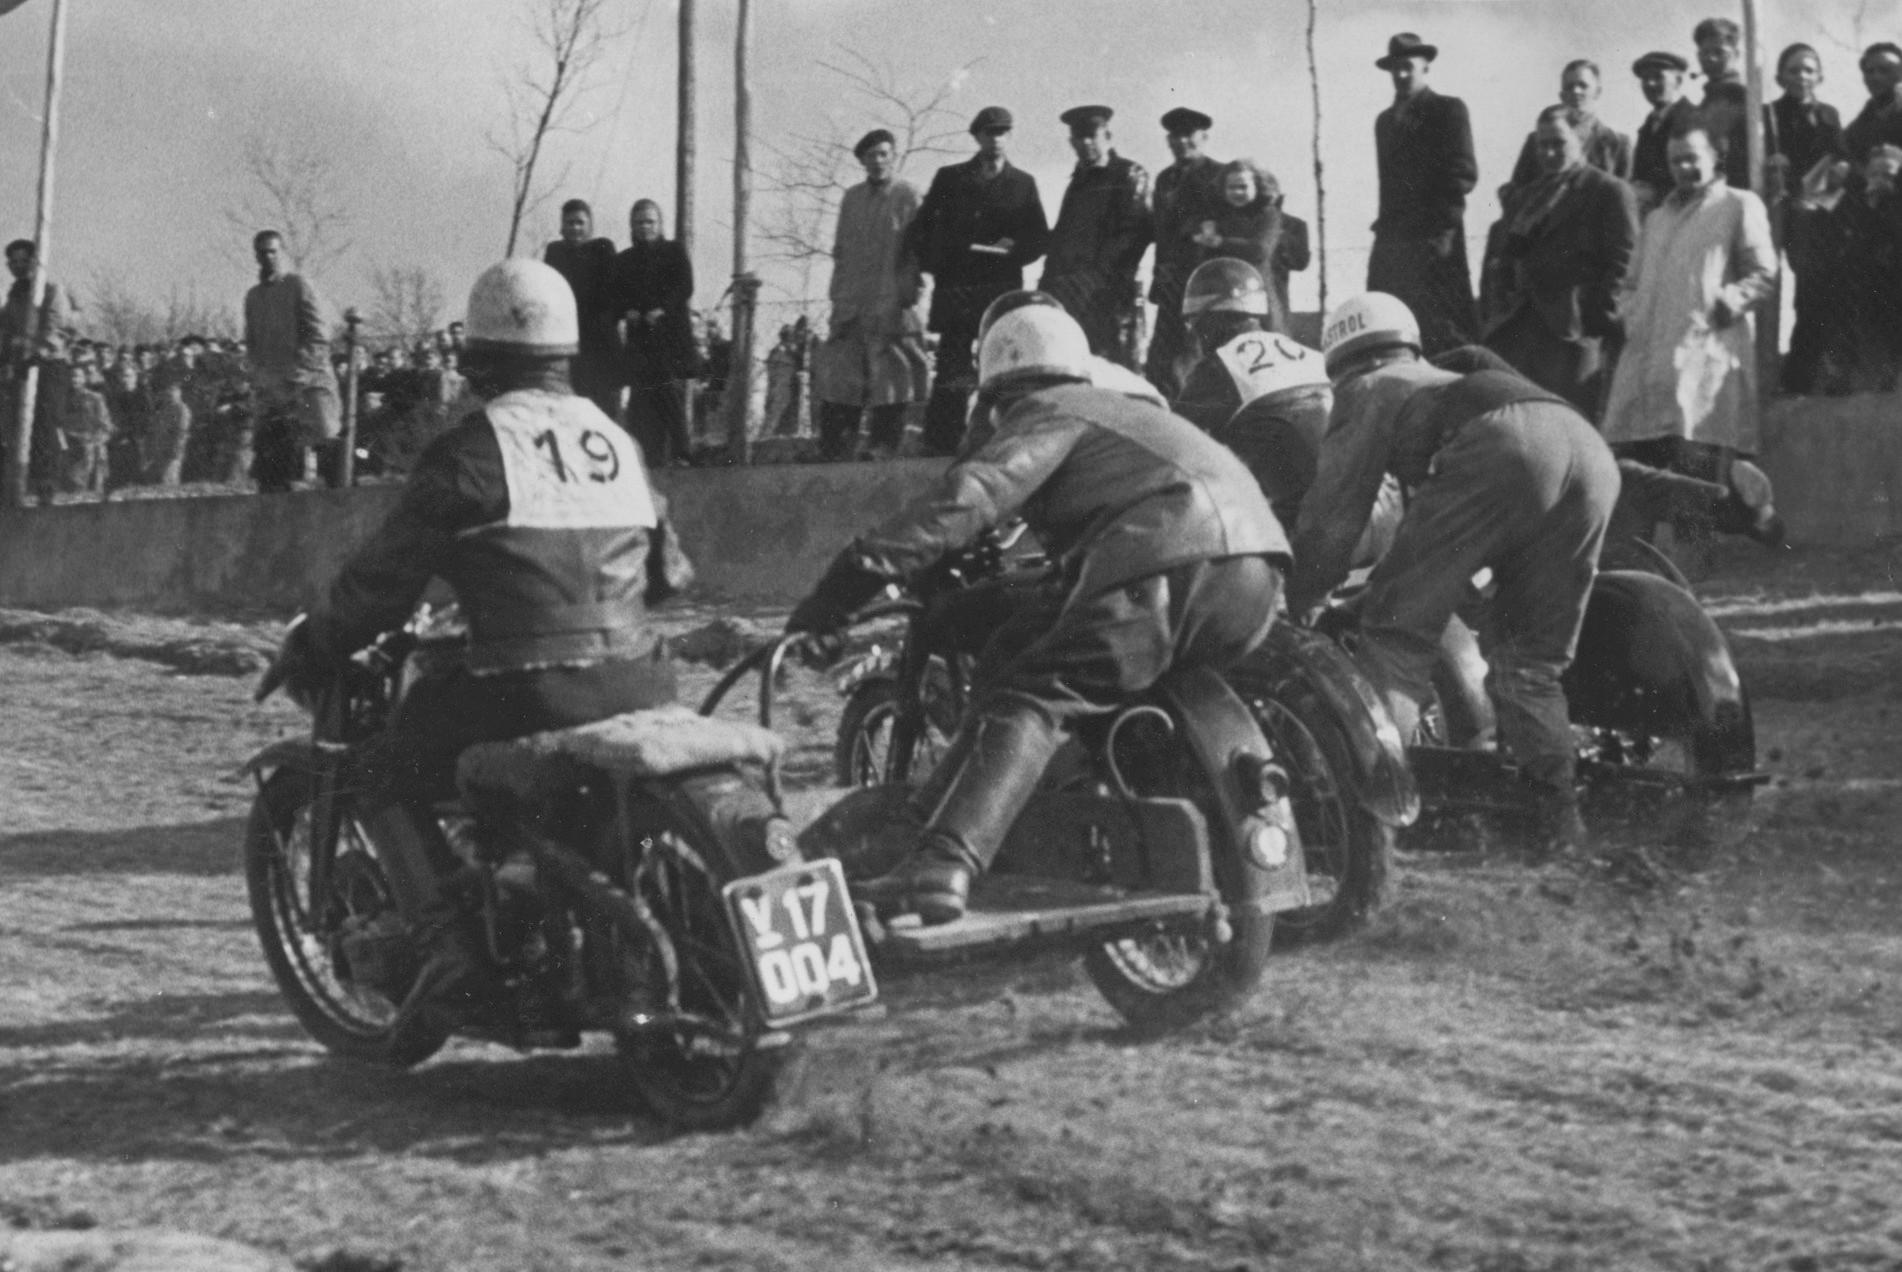 Volk Mølle St. Bedag 1951. Bakkeløbene her er blevet afløst af moto-cross. Her en sidevognsstart, hvor Gunnar og Aksel lige kan skimtes mellem nr. 19 Sølvsten Madsen på Zündapp og 20. Rasmus Kornum.